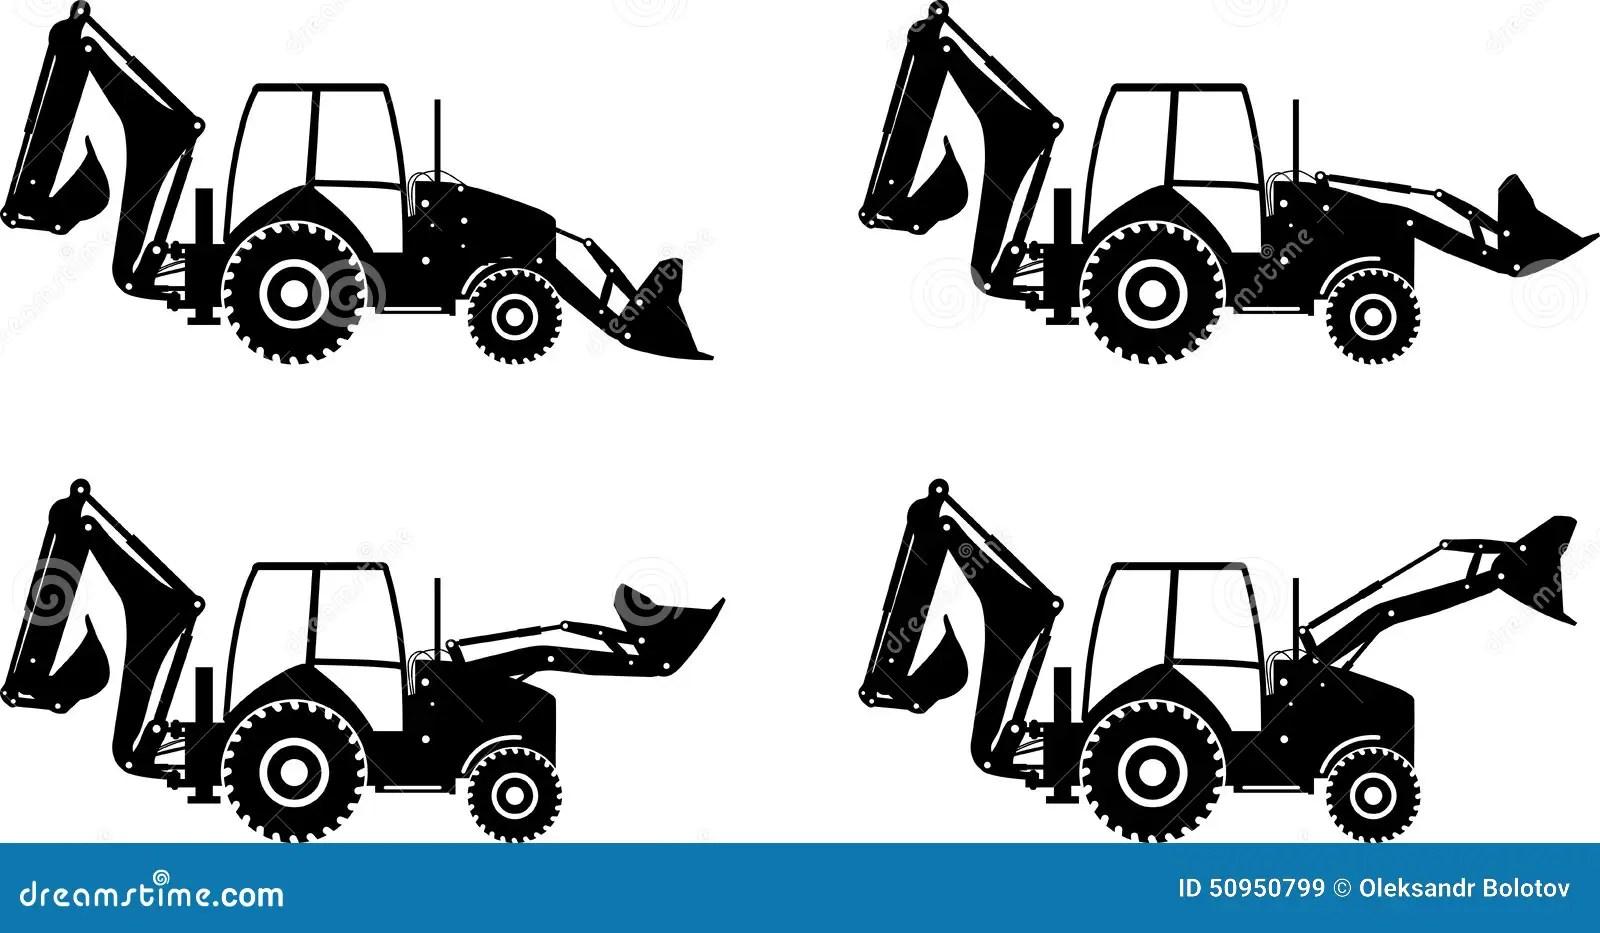 Backhoe Loaders Heavy Construction Machines Vector Illustration Stock Illustration